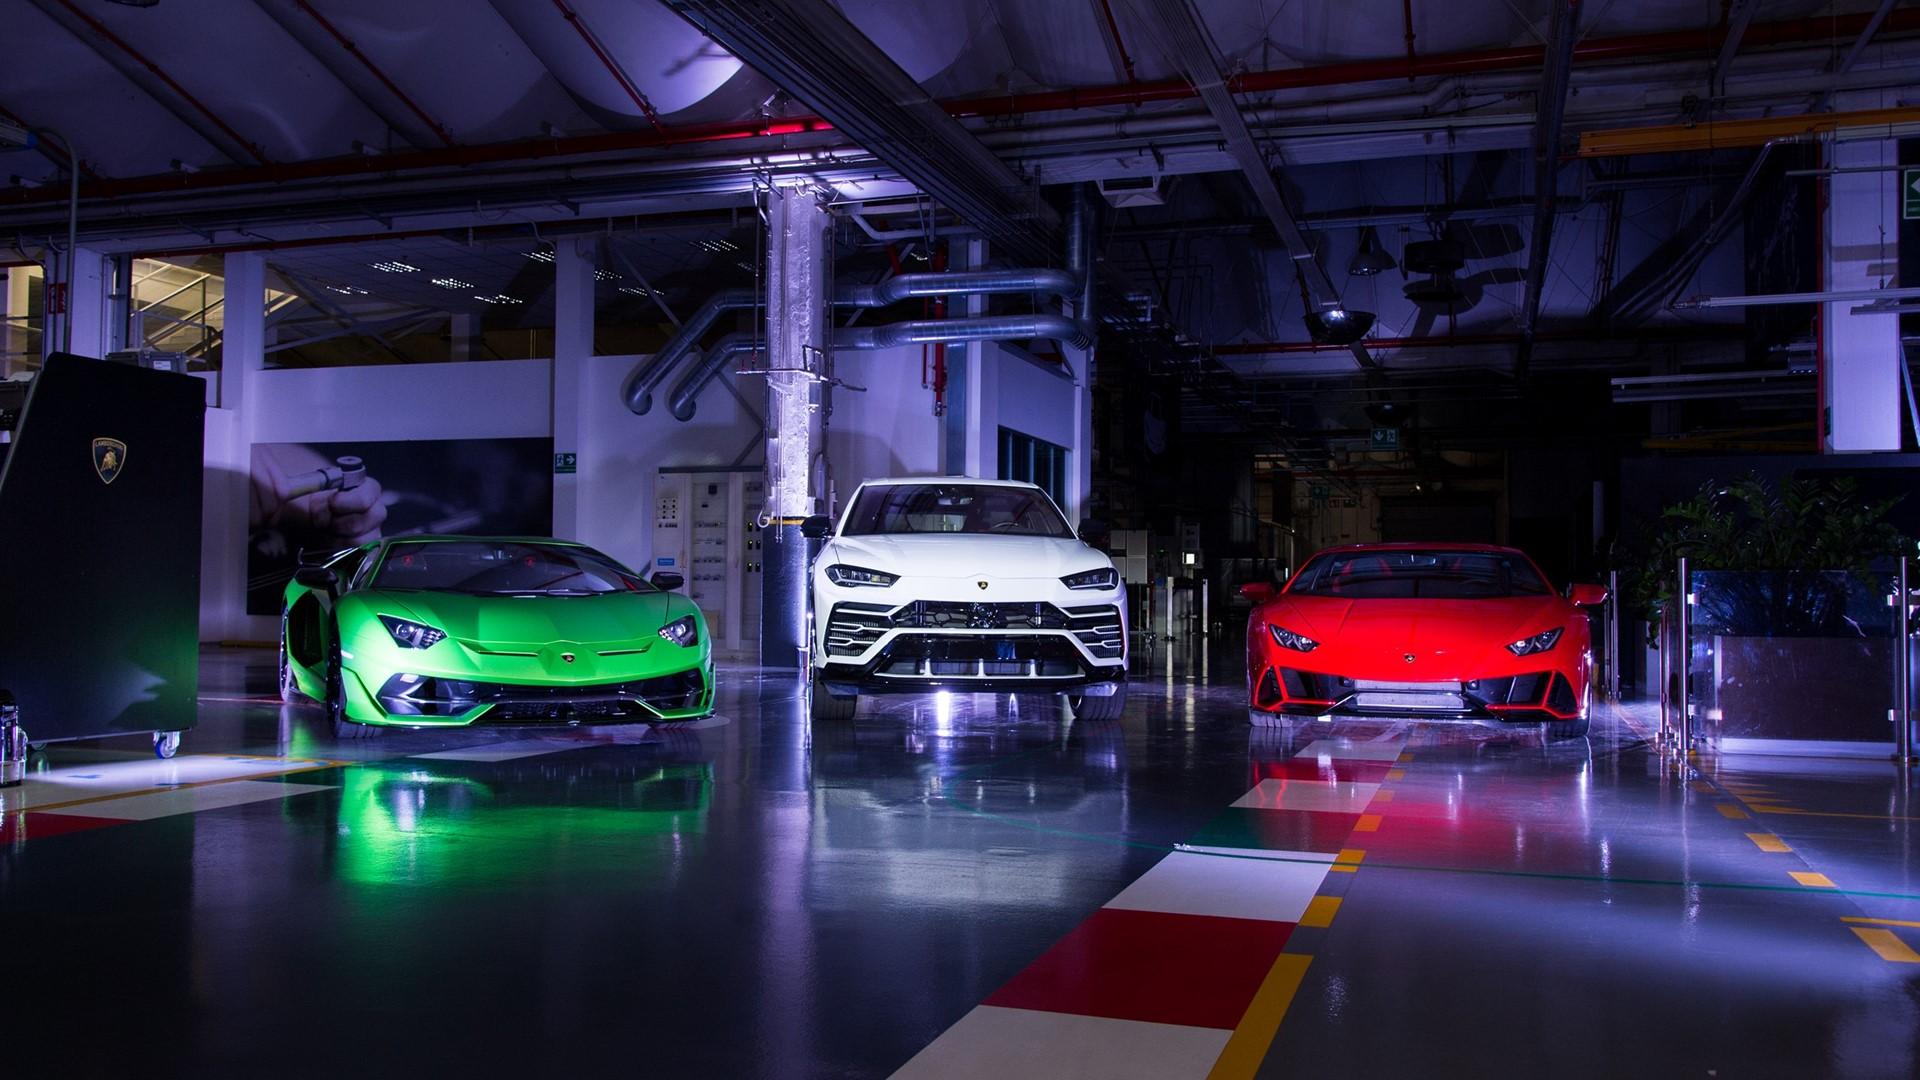 Lamborghini Christmas Drive: a holiday journey with Aventador SVJ, Huracán EVO and Urus celebrates a successful 2019 - Image 8